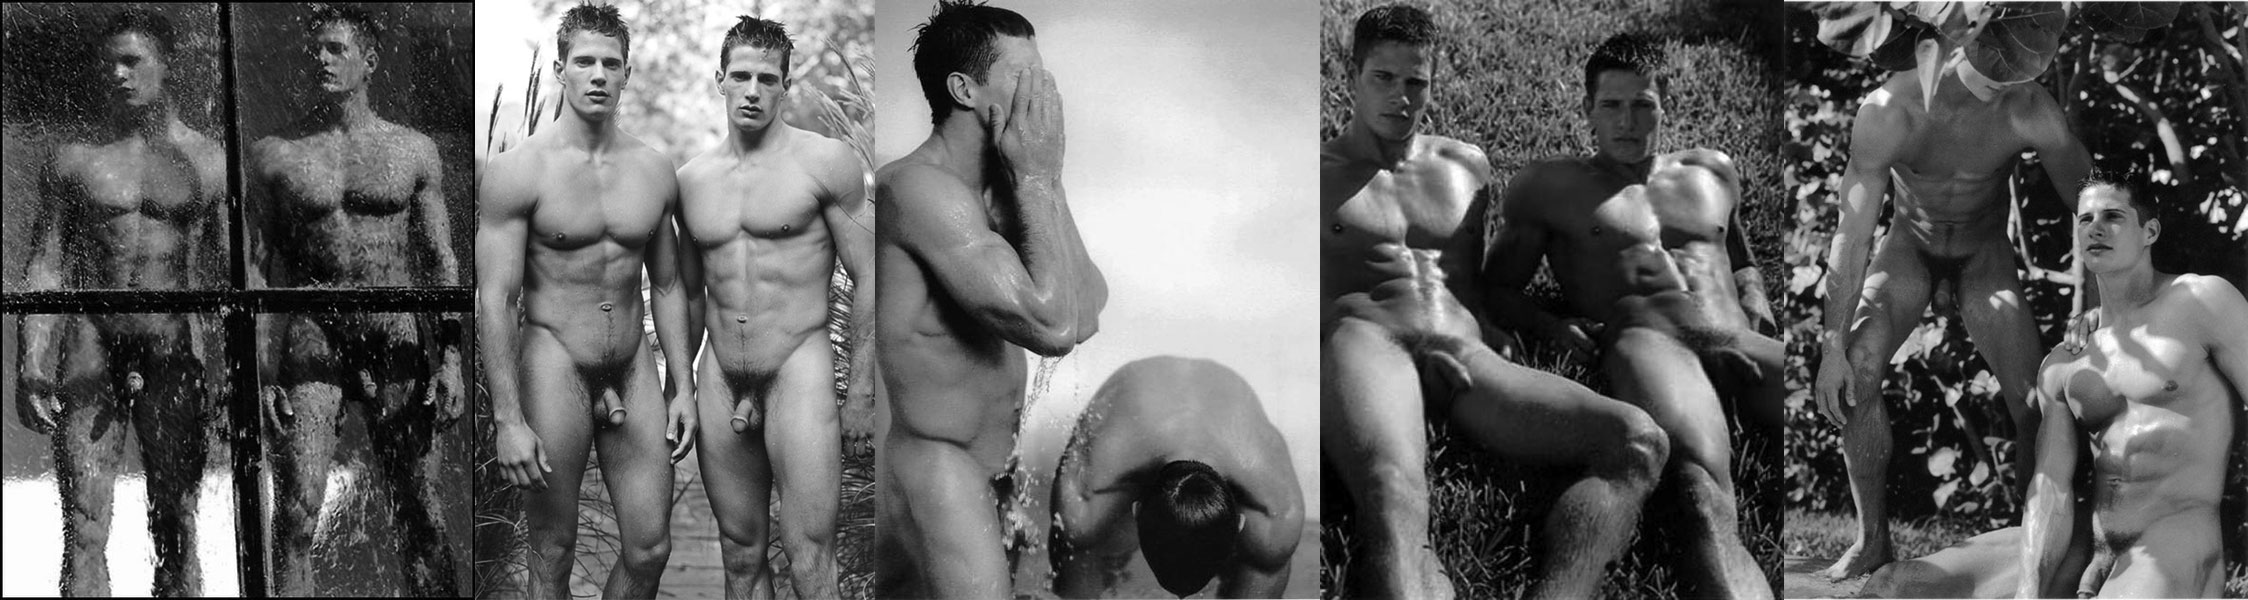 Bro Hoes Nude Tumblr Porn Videos Pornhubcom